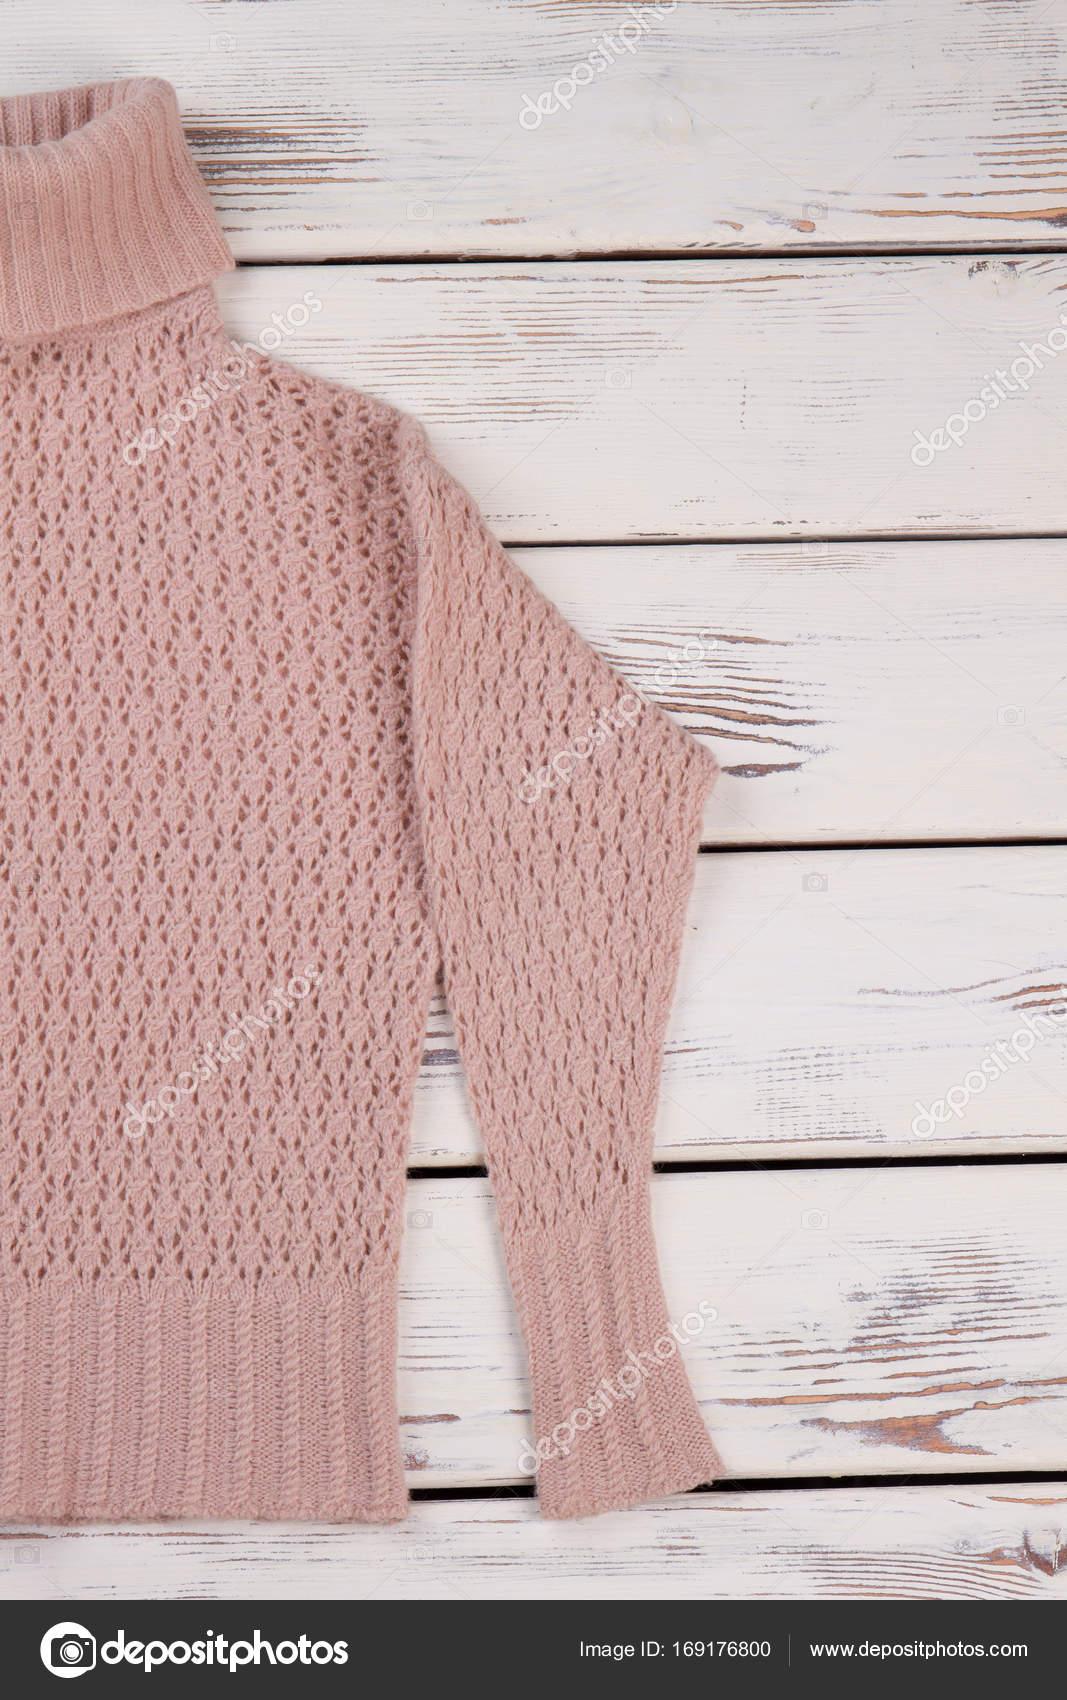 c8759cfc2f66 Γκρο πλαν σε πλεκτό πουλόβερ με ΖΙΒΑΓΚΟ. Απαλό ροδακινί χρώμα για γυναικεία  χειμερινά ρούχα. Ψάχνετε γοητευτική με χειροποίητα ρούχα — Εικόνα από ...